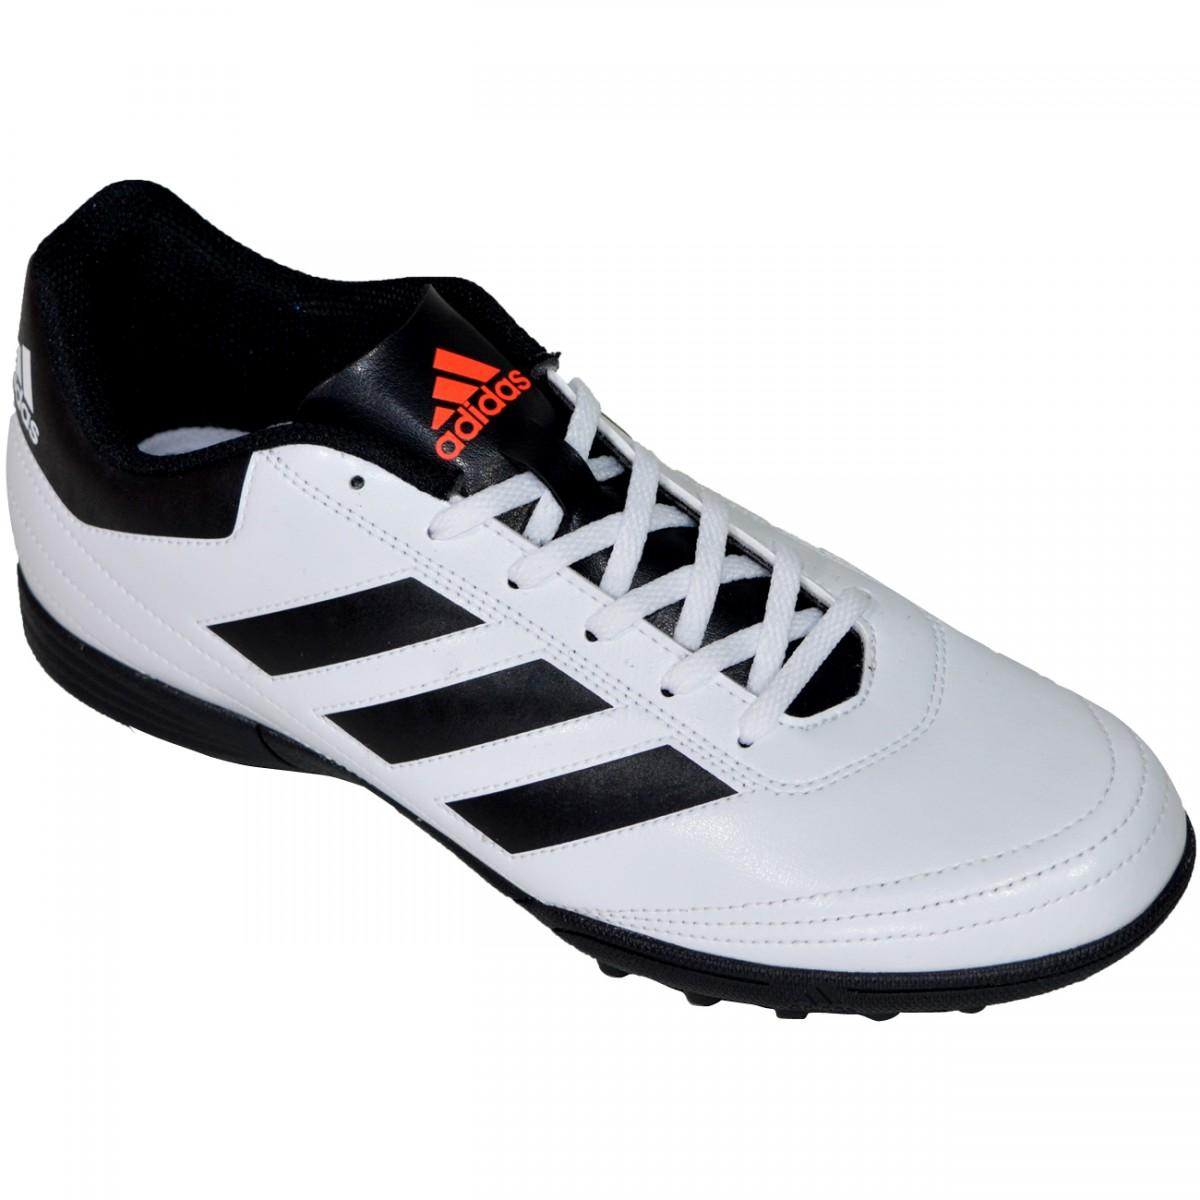 3268303231 Chuteira Society Adidas Goletto VI AQ4302 - Branco Preto - Chuteira Nike